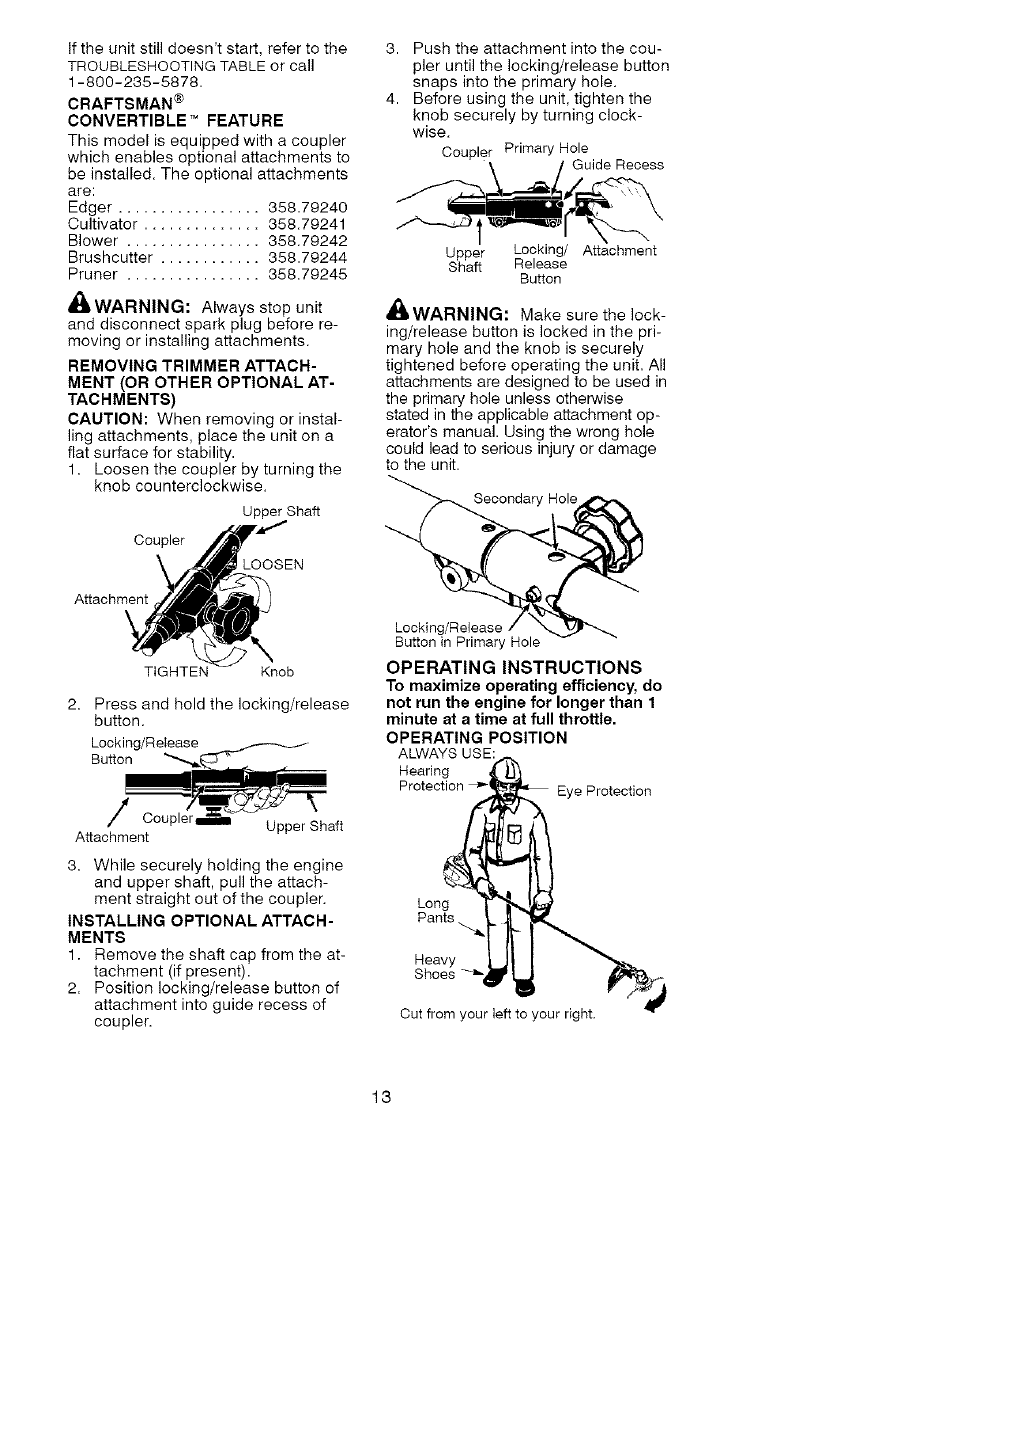 Craftsman 358 791051 Users Manual